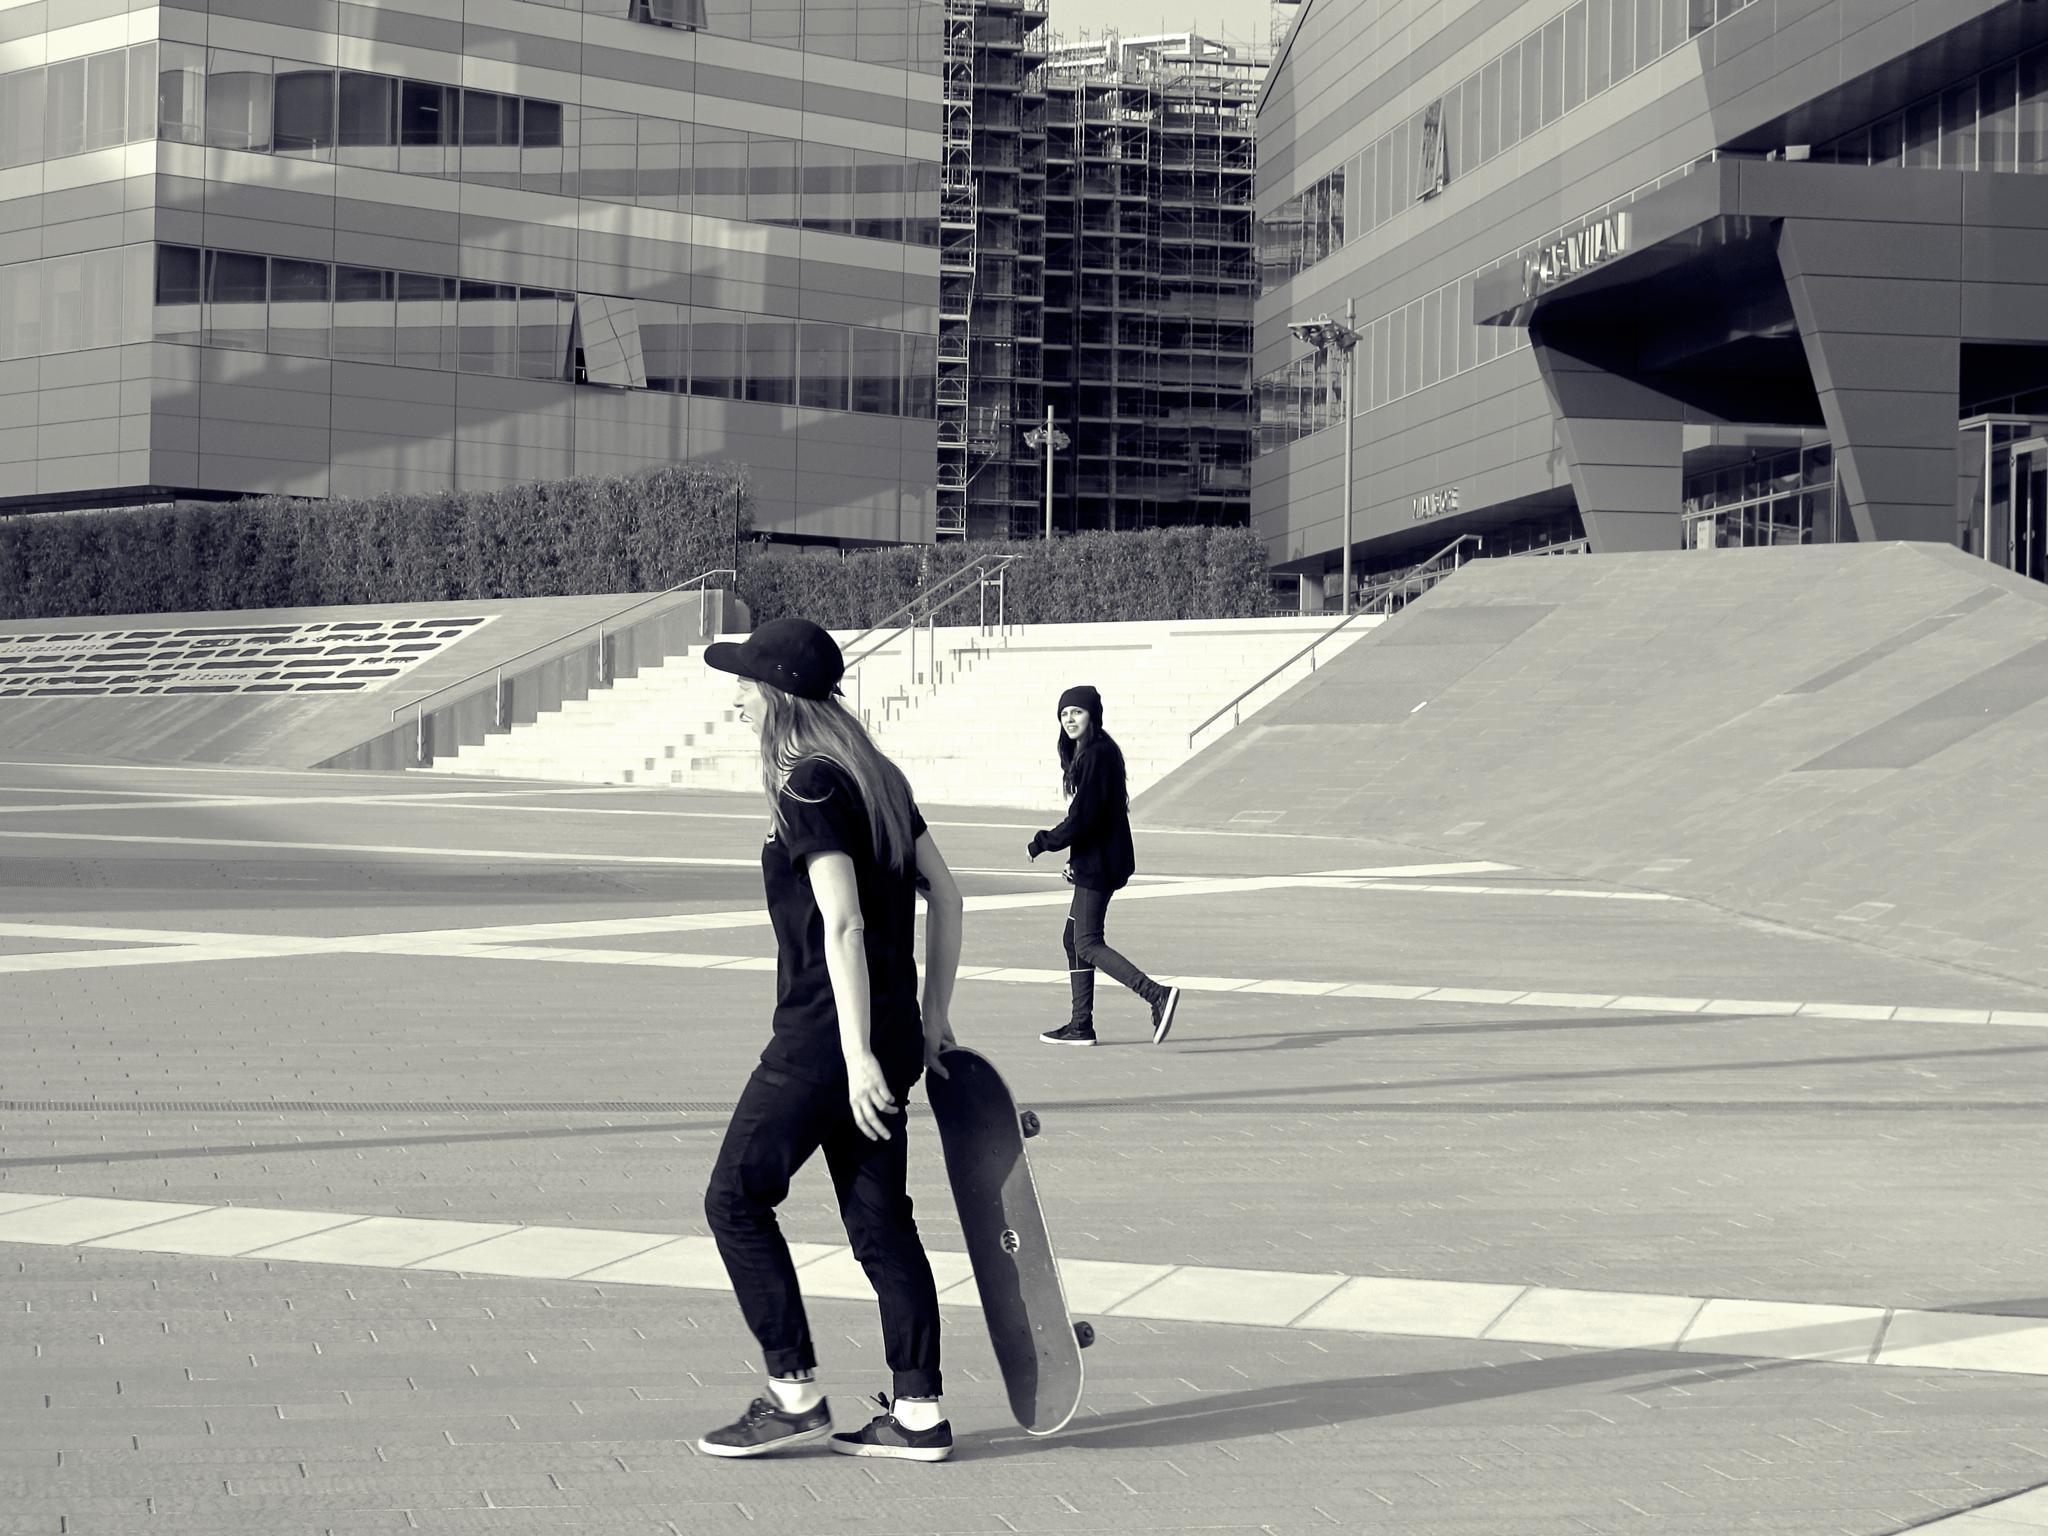 Girls Skater In Milano by marco.trabucchi